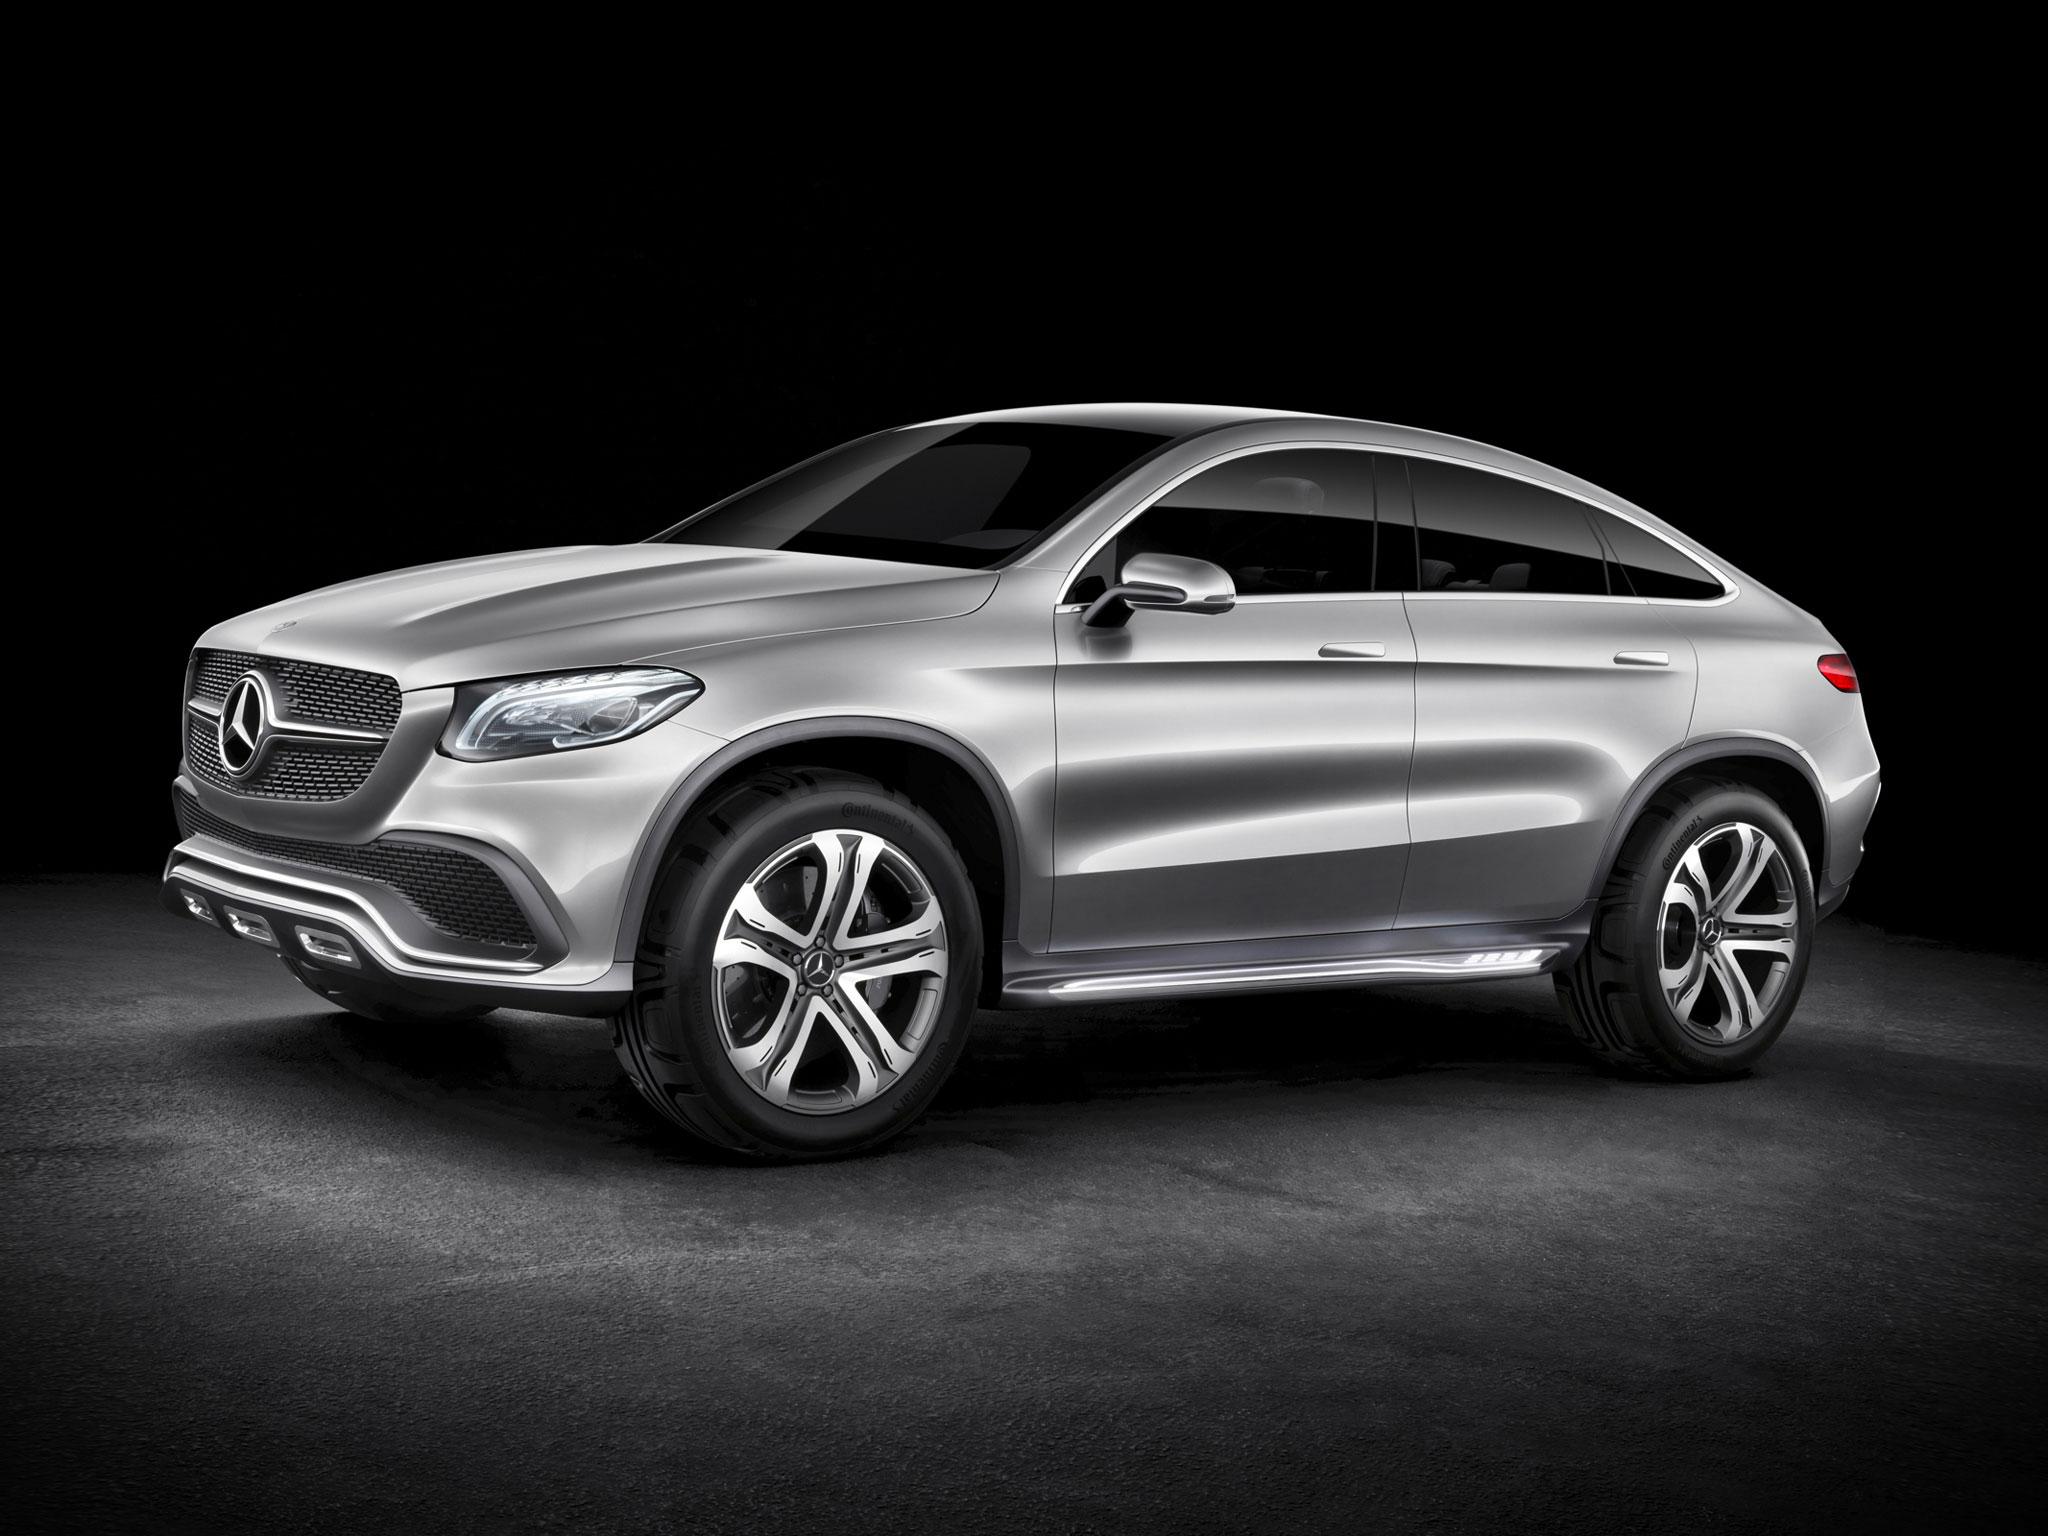 Mercedes Benz Suv Models Pictures